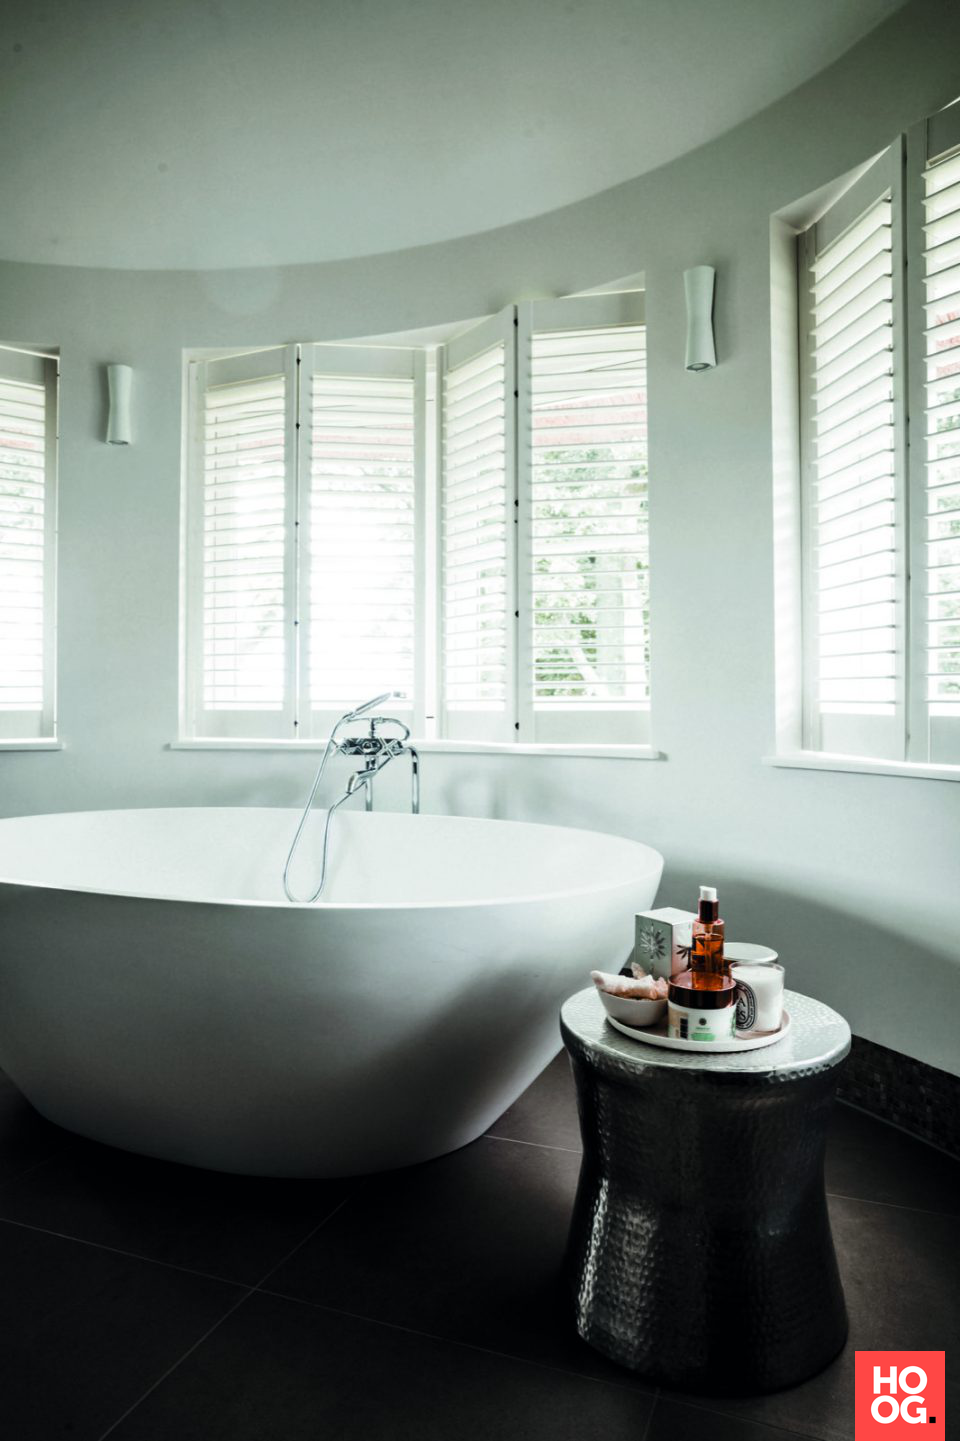 Badkamer design met luxe ligbad | Rietgedekte Villa Blaricum ...